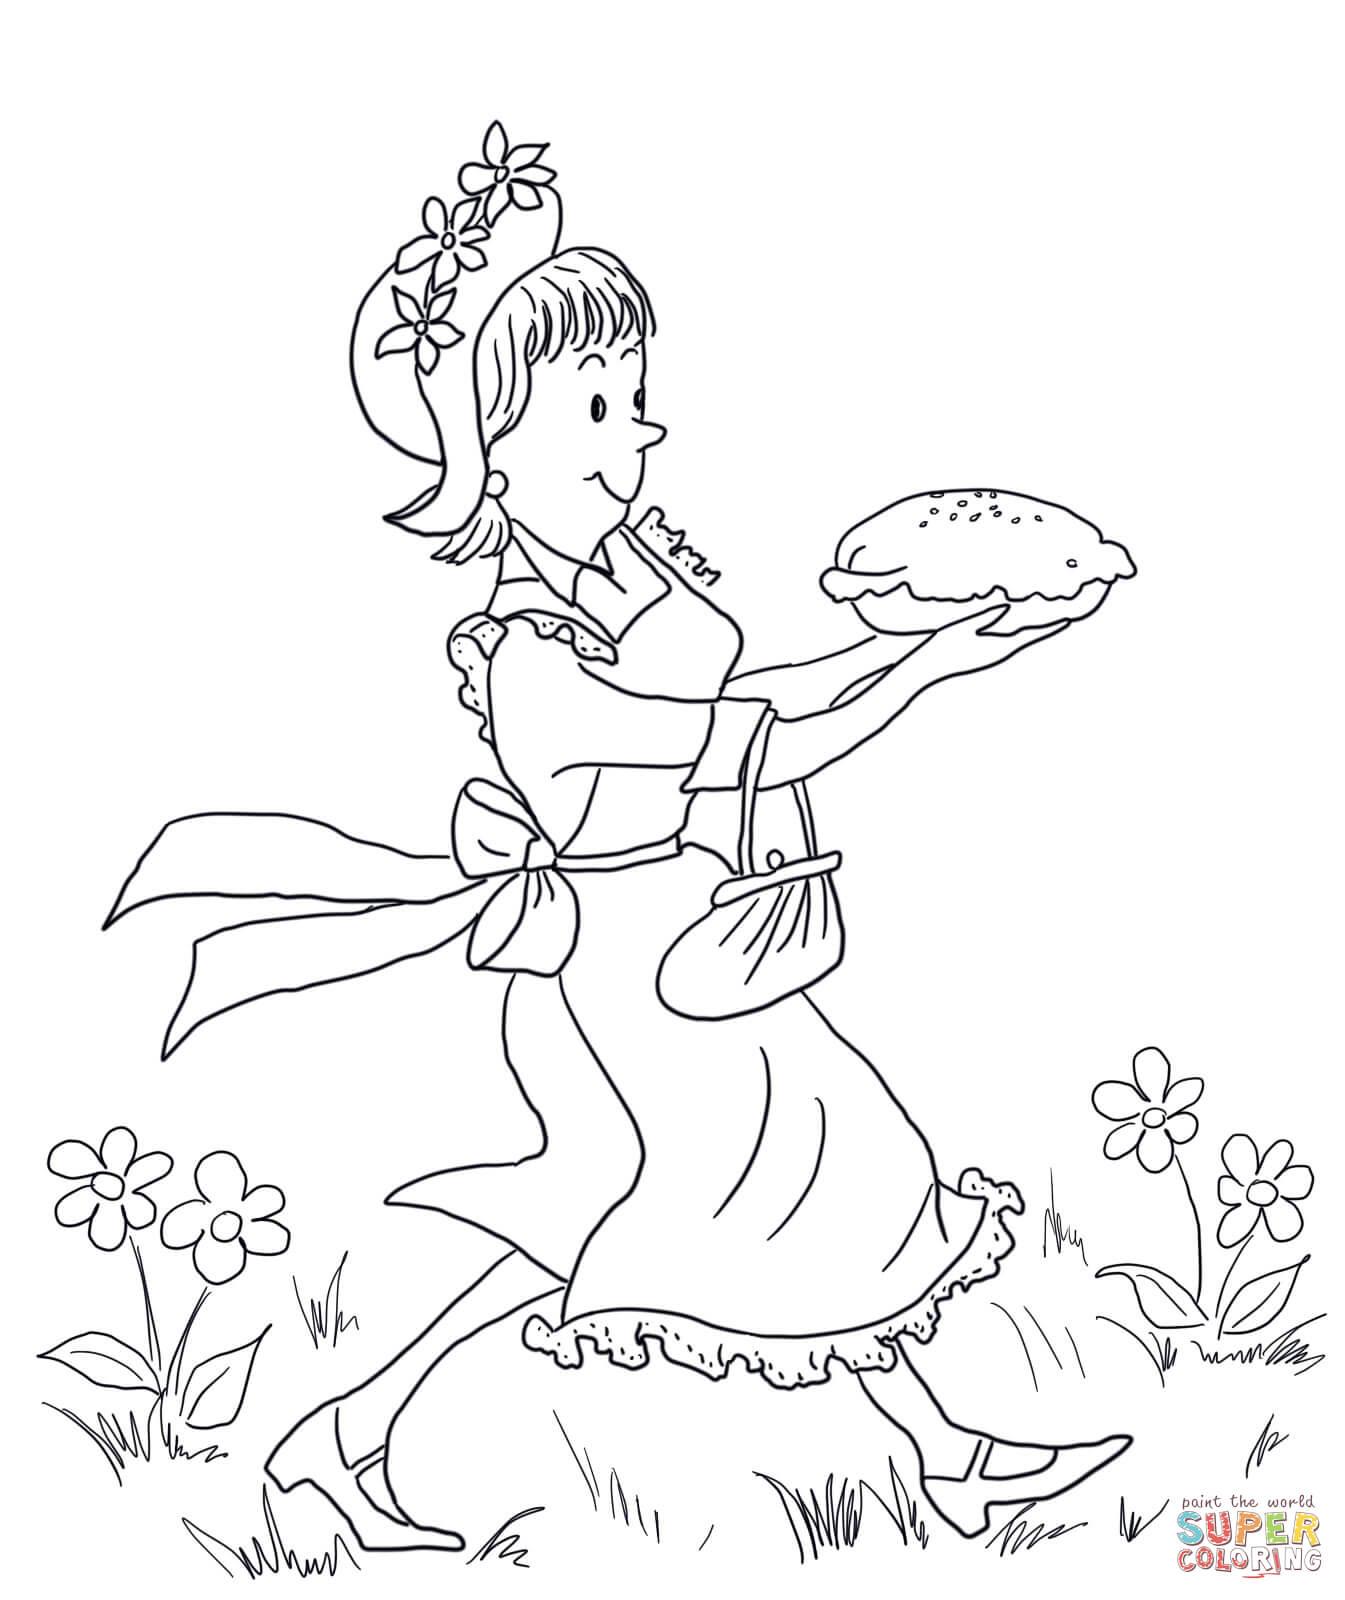 Amelia Bedelia Carrying Lemon Meringue Pie Coloring Page